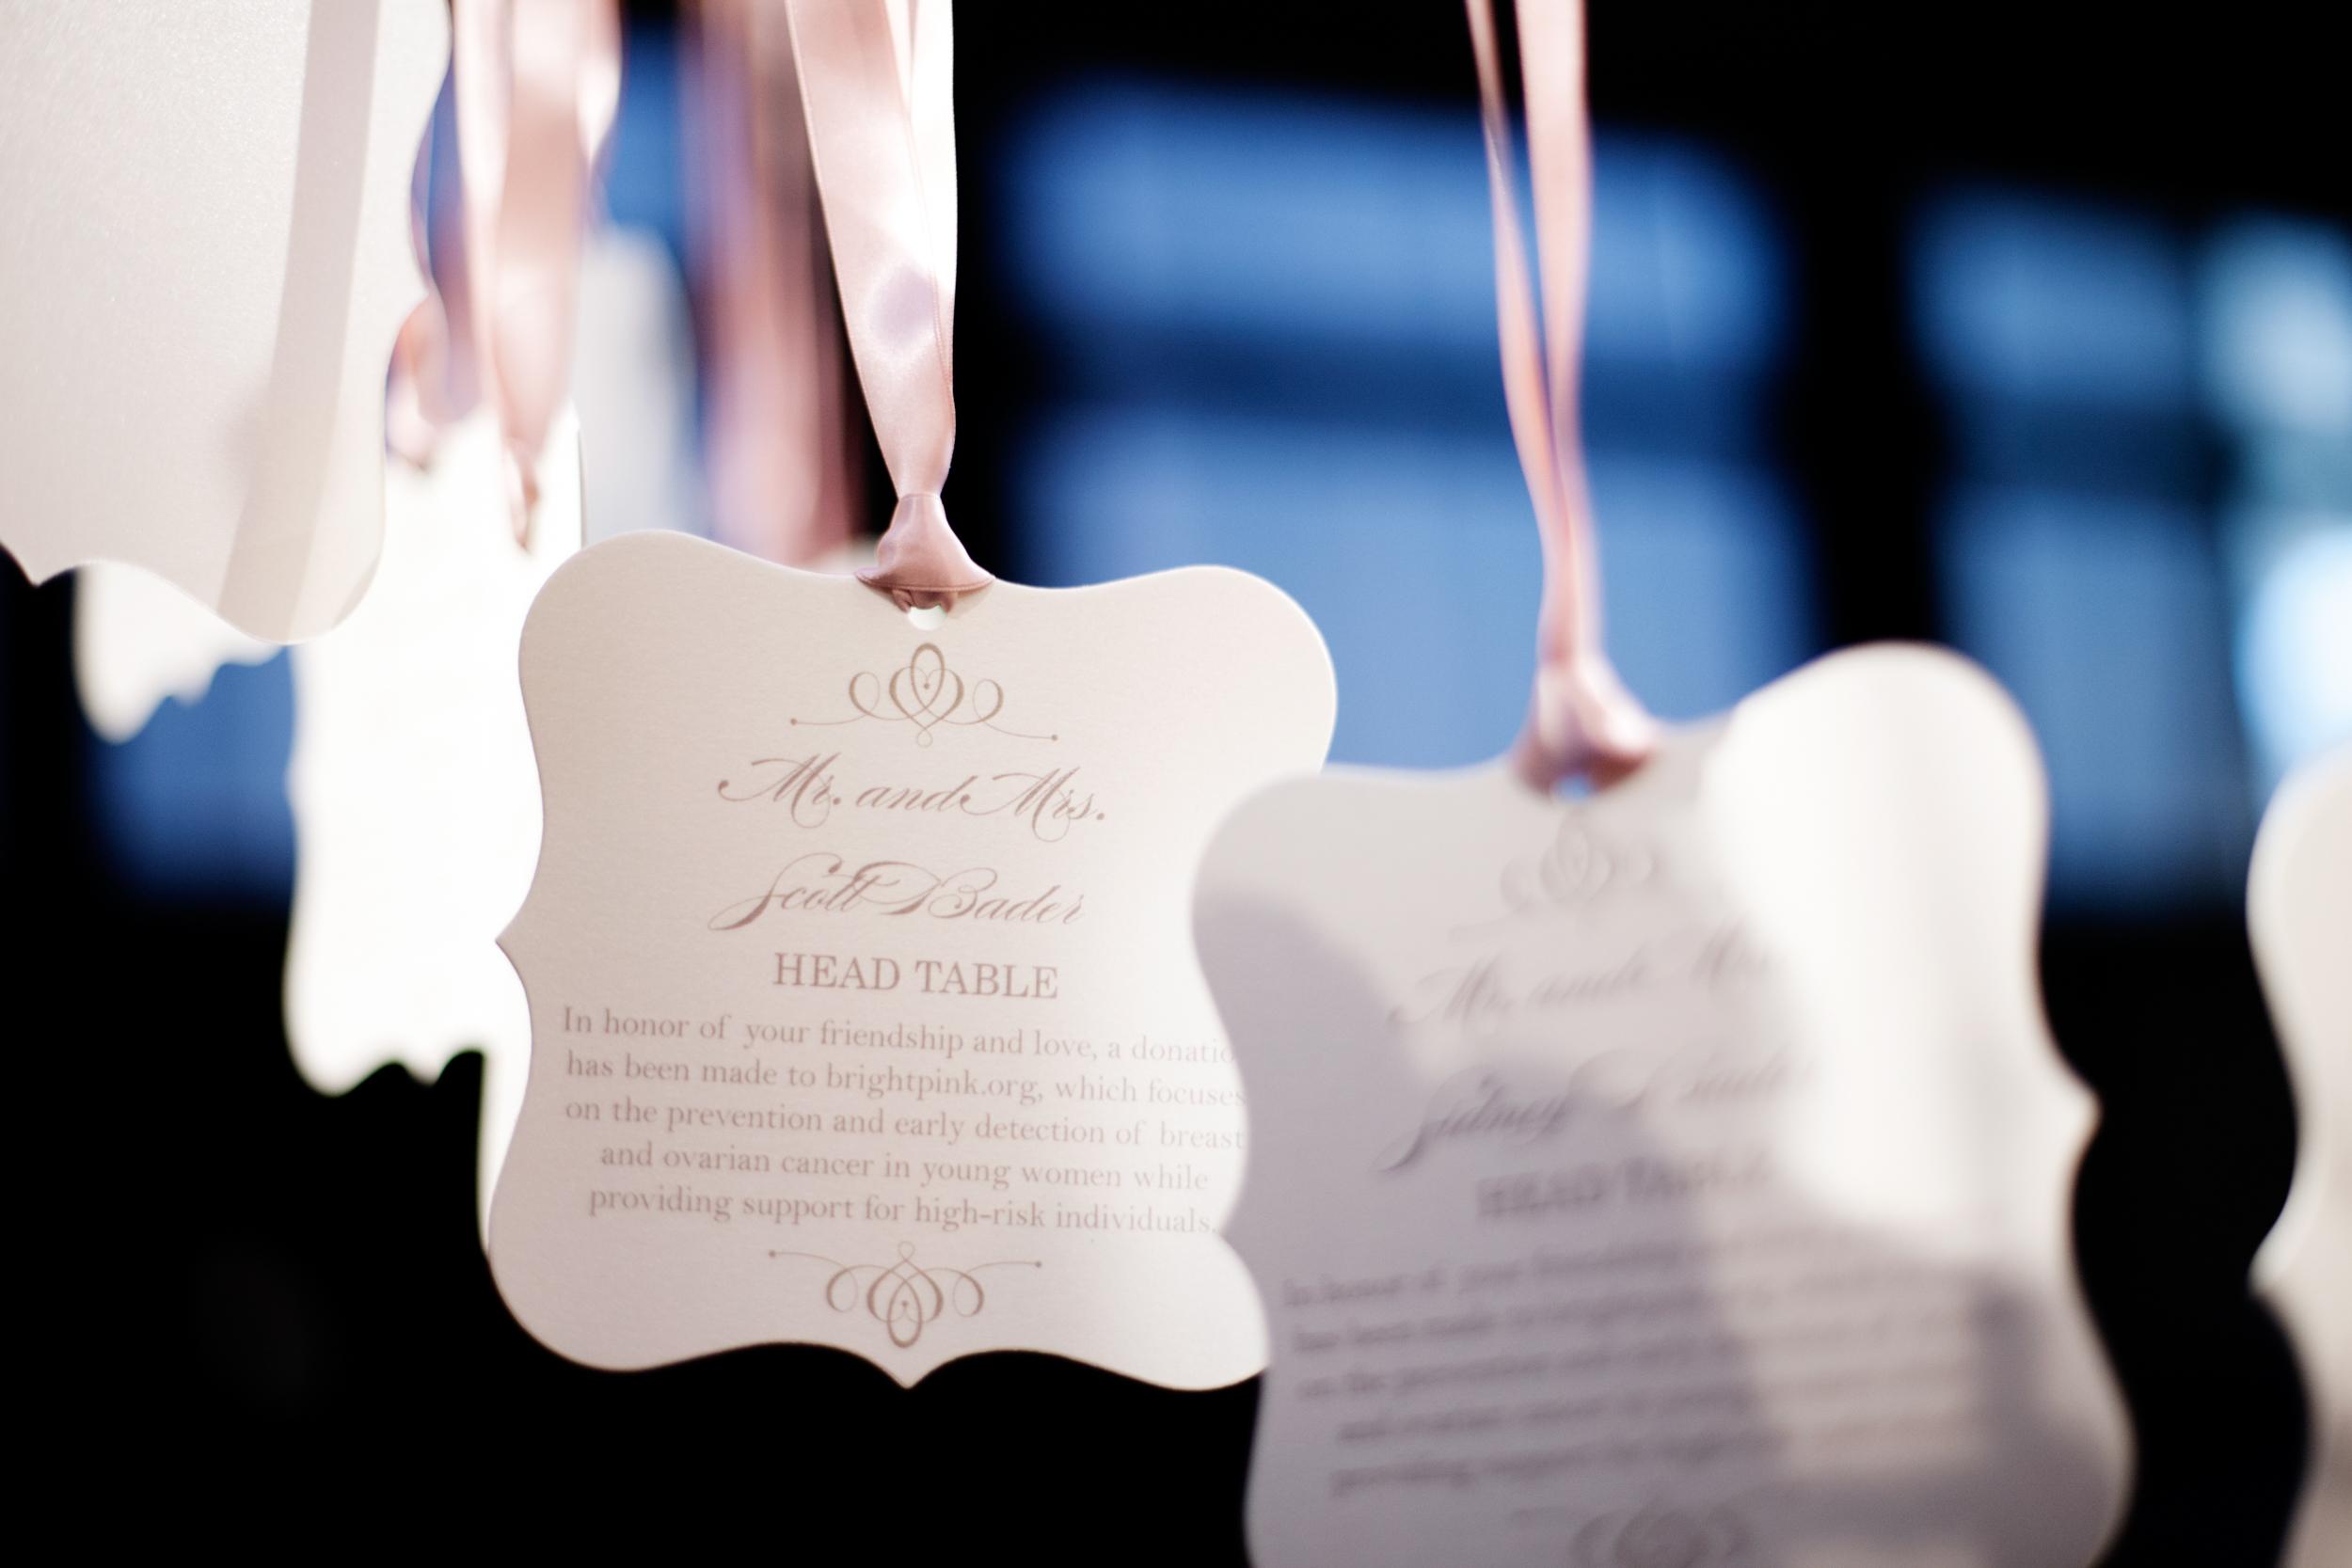 Ceci_New_York_Ceci_Style_Ceci_Johnson_Luxury_Lifestyle_Floral_Lace_Wedding_Letterpress_Inspiration_Design_Custom_Couture_Personalized_Invitations_-61.jpg